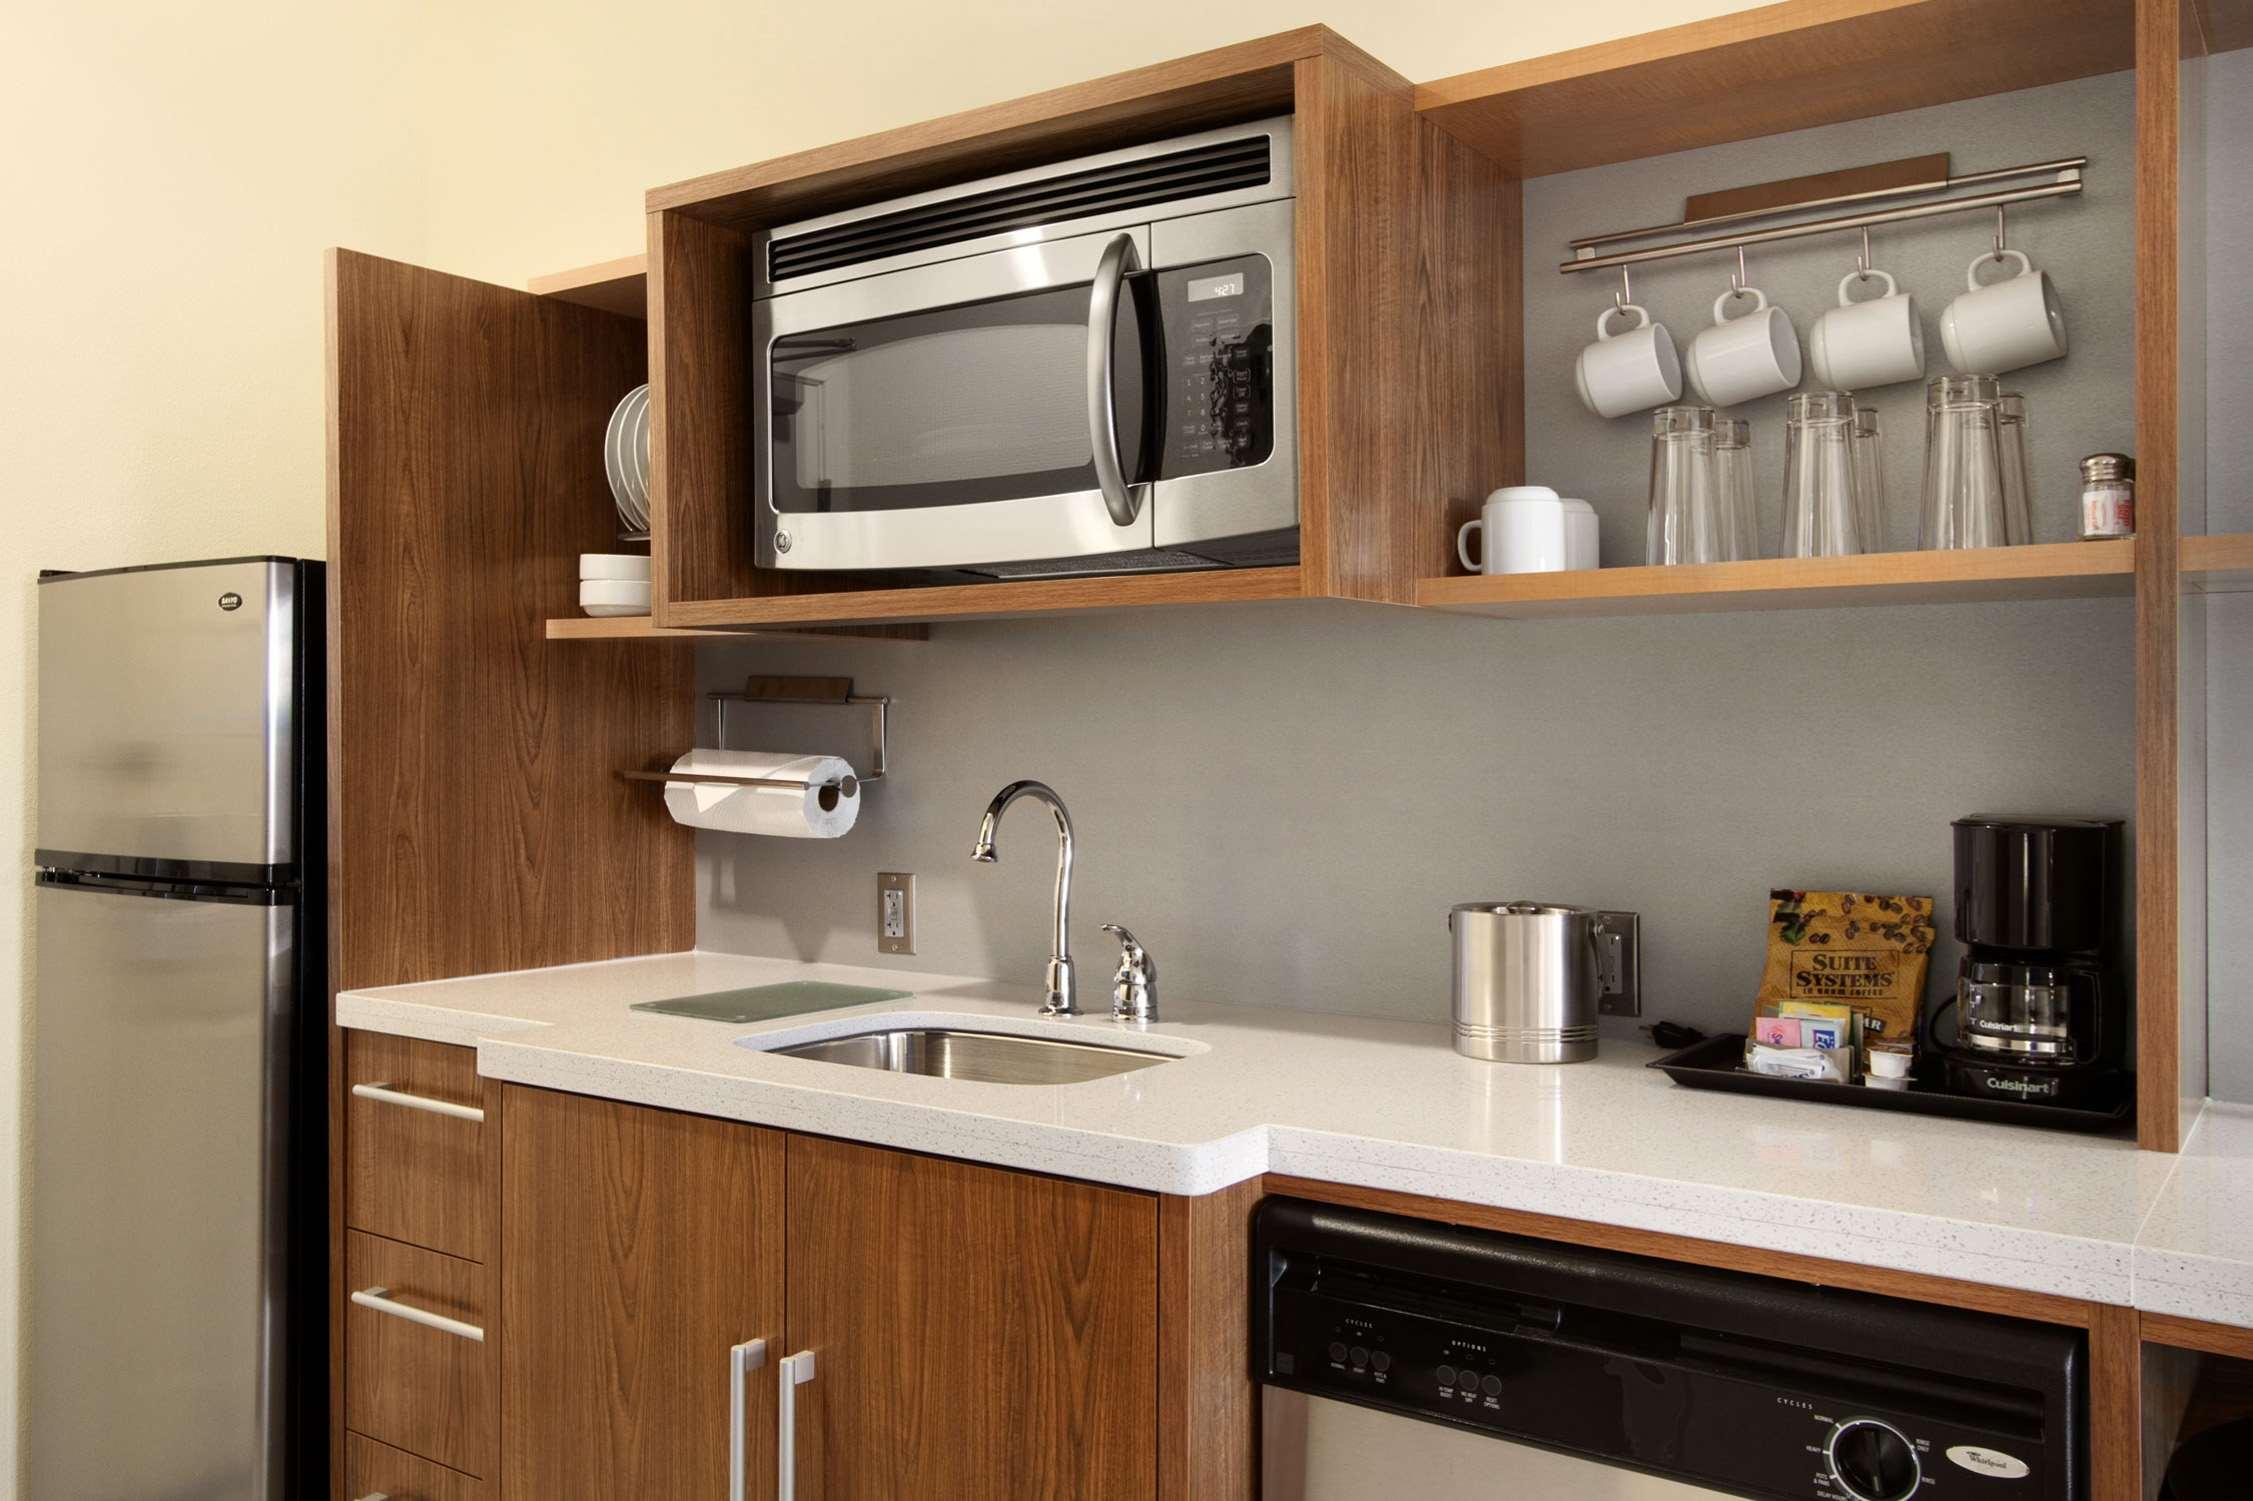 Home2 Suites by Hilton Fayetteville, NC image 4